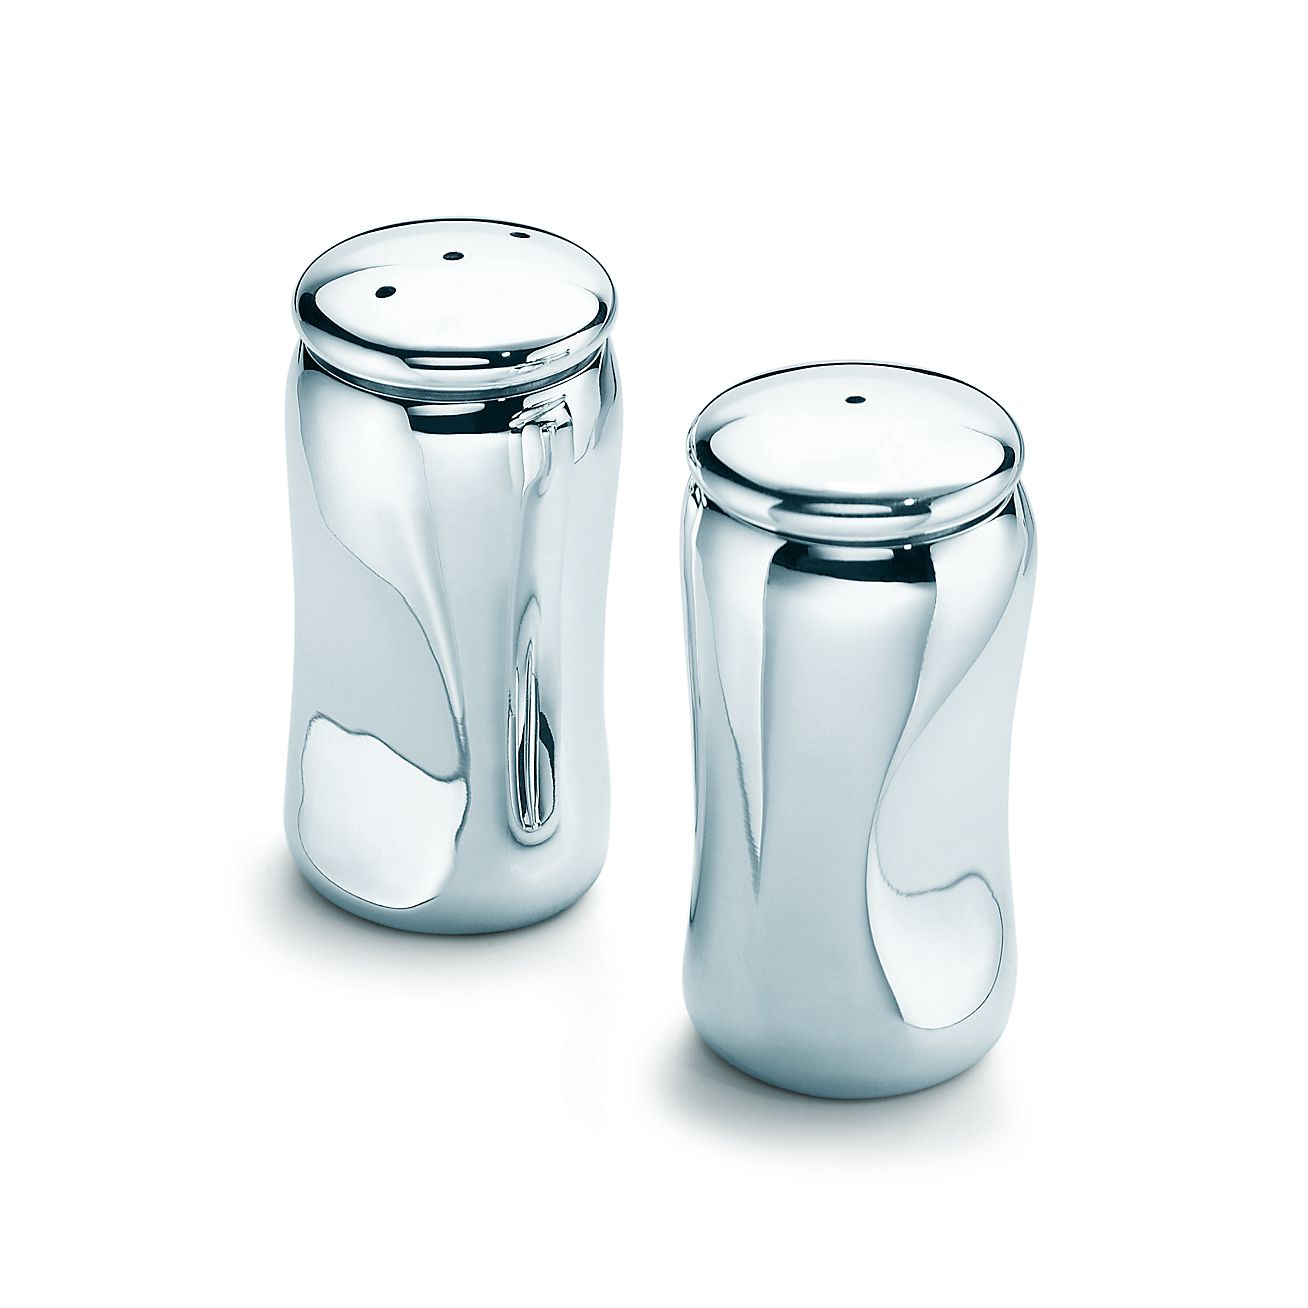 Elsa Peretti Thumbprint Salt And Pepper Shakers Silver Tiffany Co